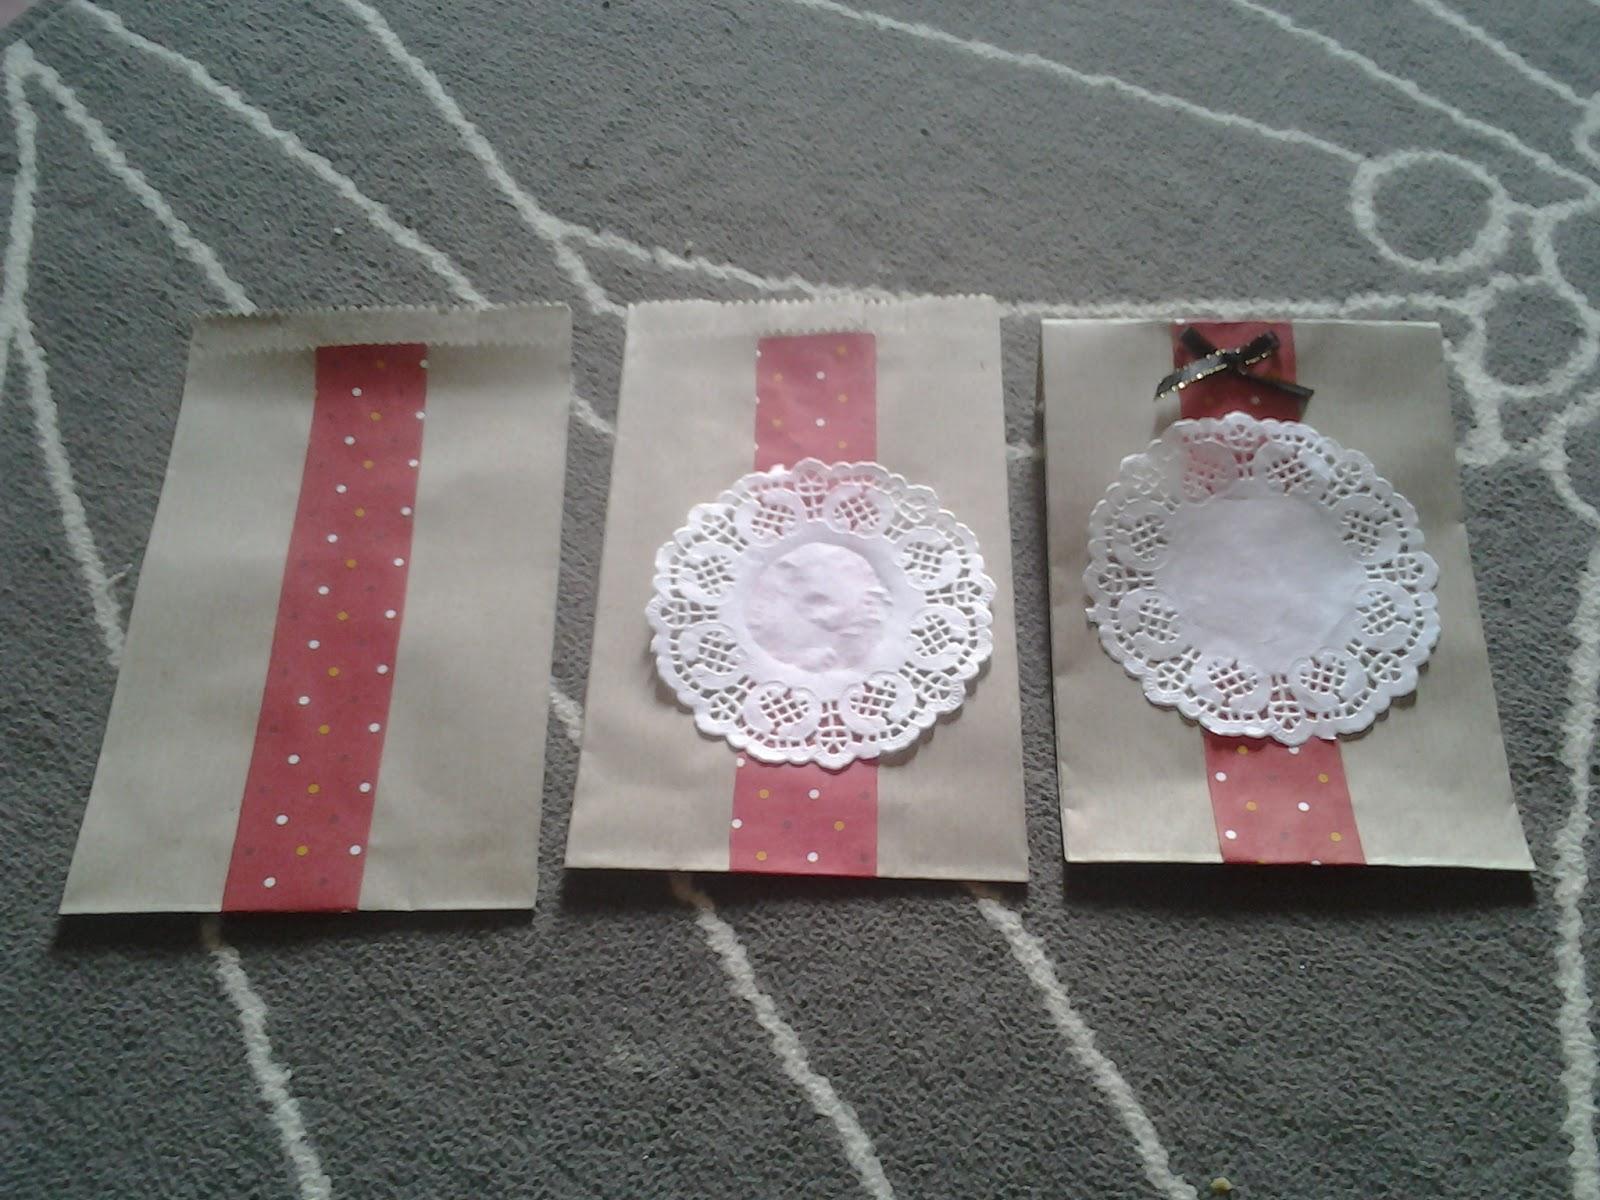 Szcutesweet pakej door gift yang murah for Idea door gift kahwin murah